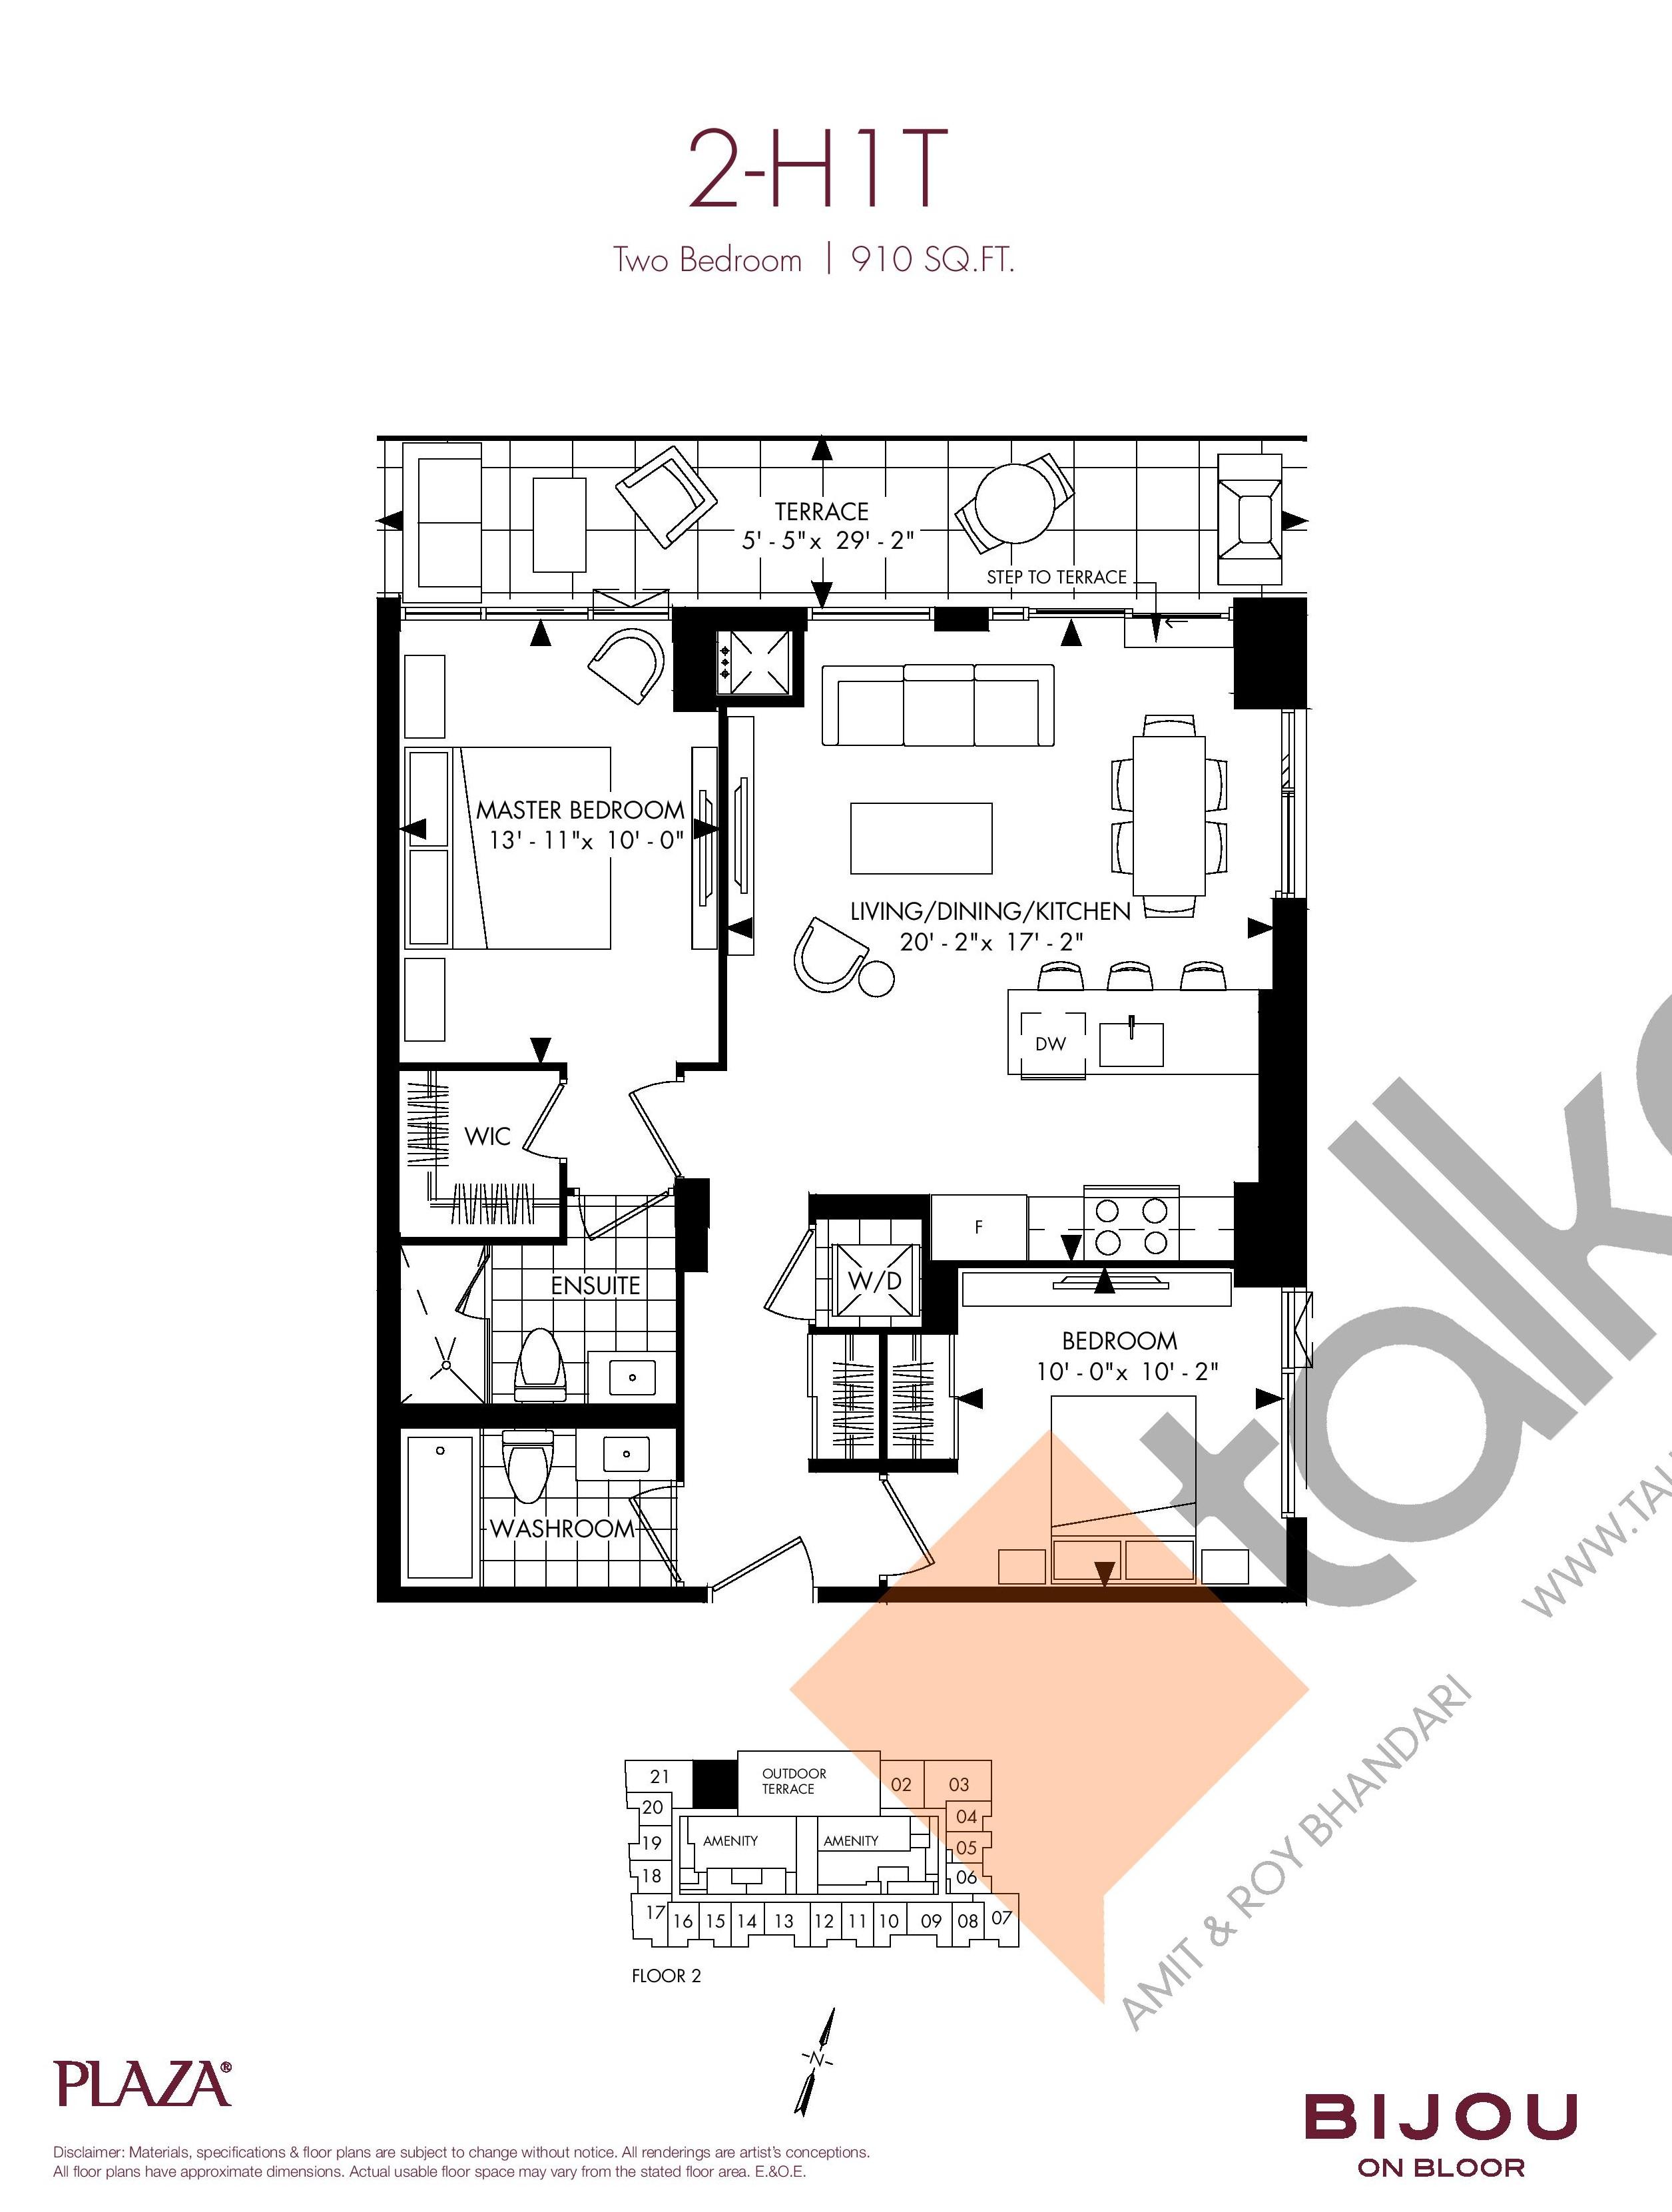 2-H1T Floor Plan at Bijou On Bloor Condos - 910 sq.ft